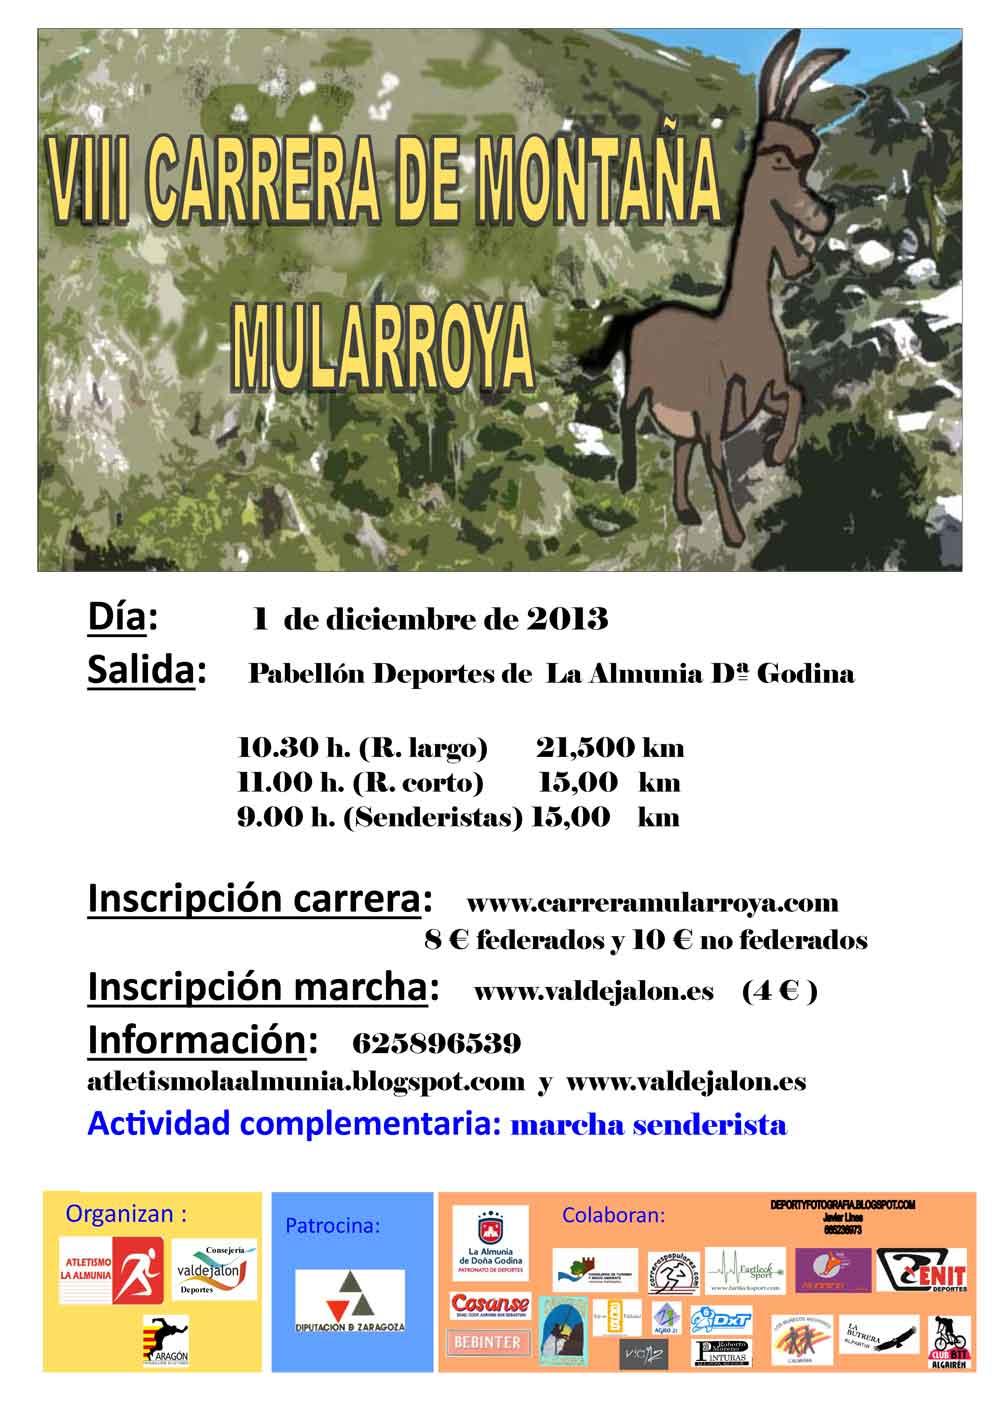 VIII CARRERA DE MONTAÑA MULARROYA - Inscrivez-vous